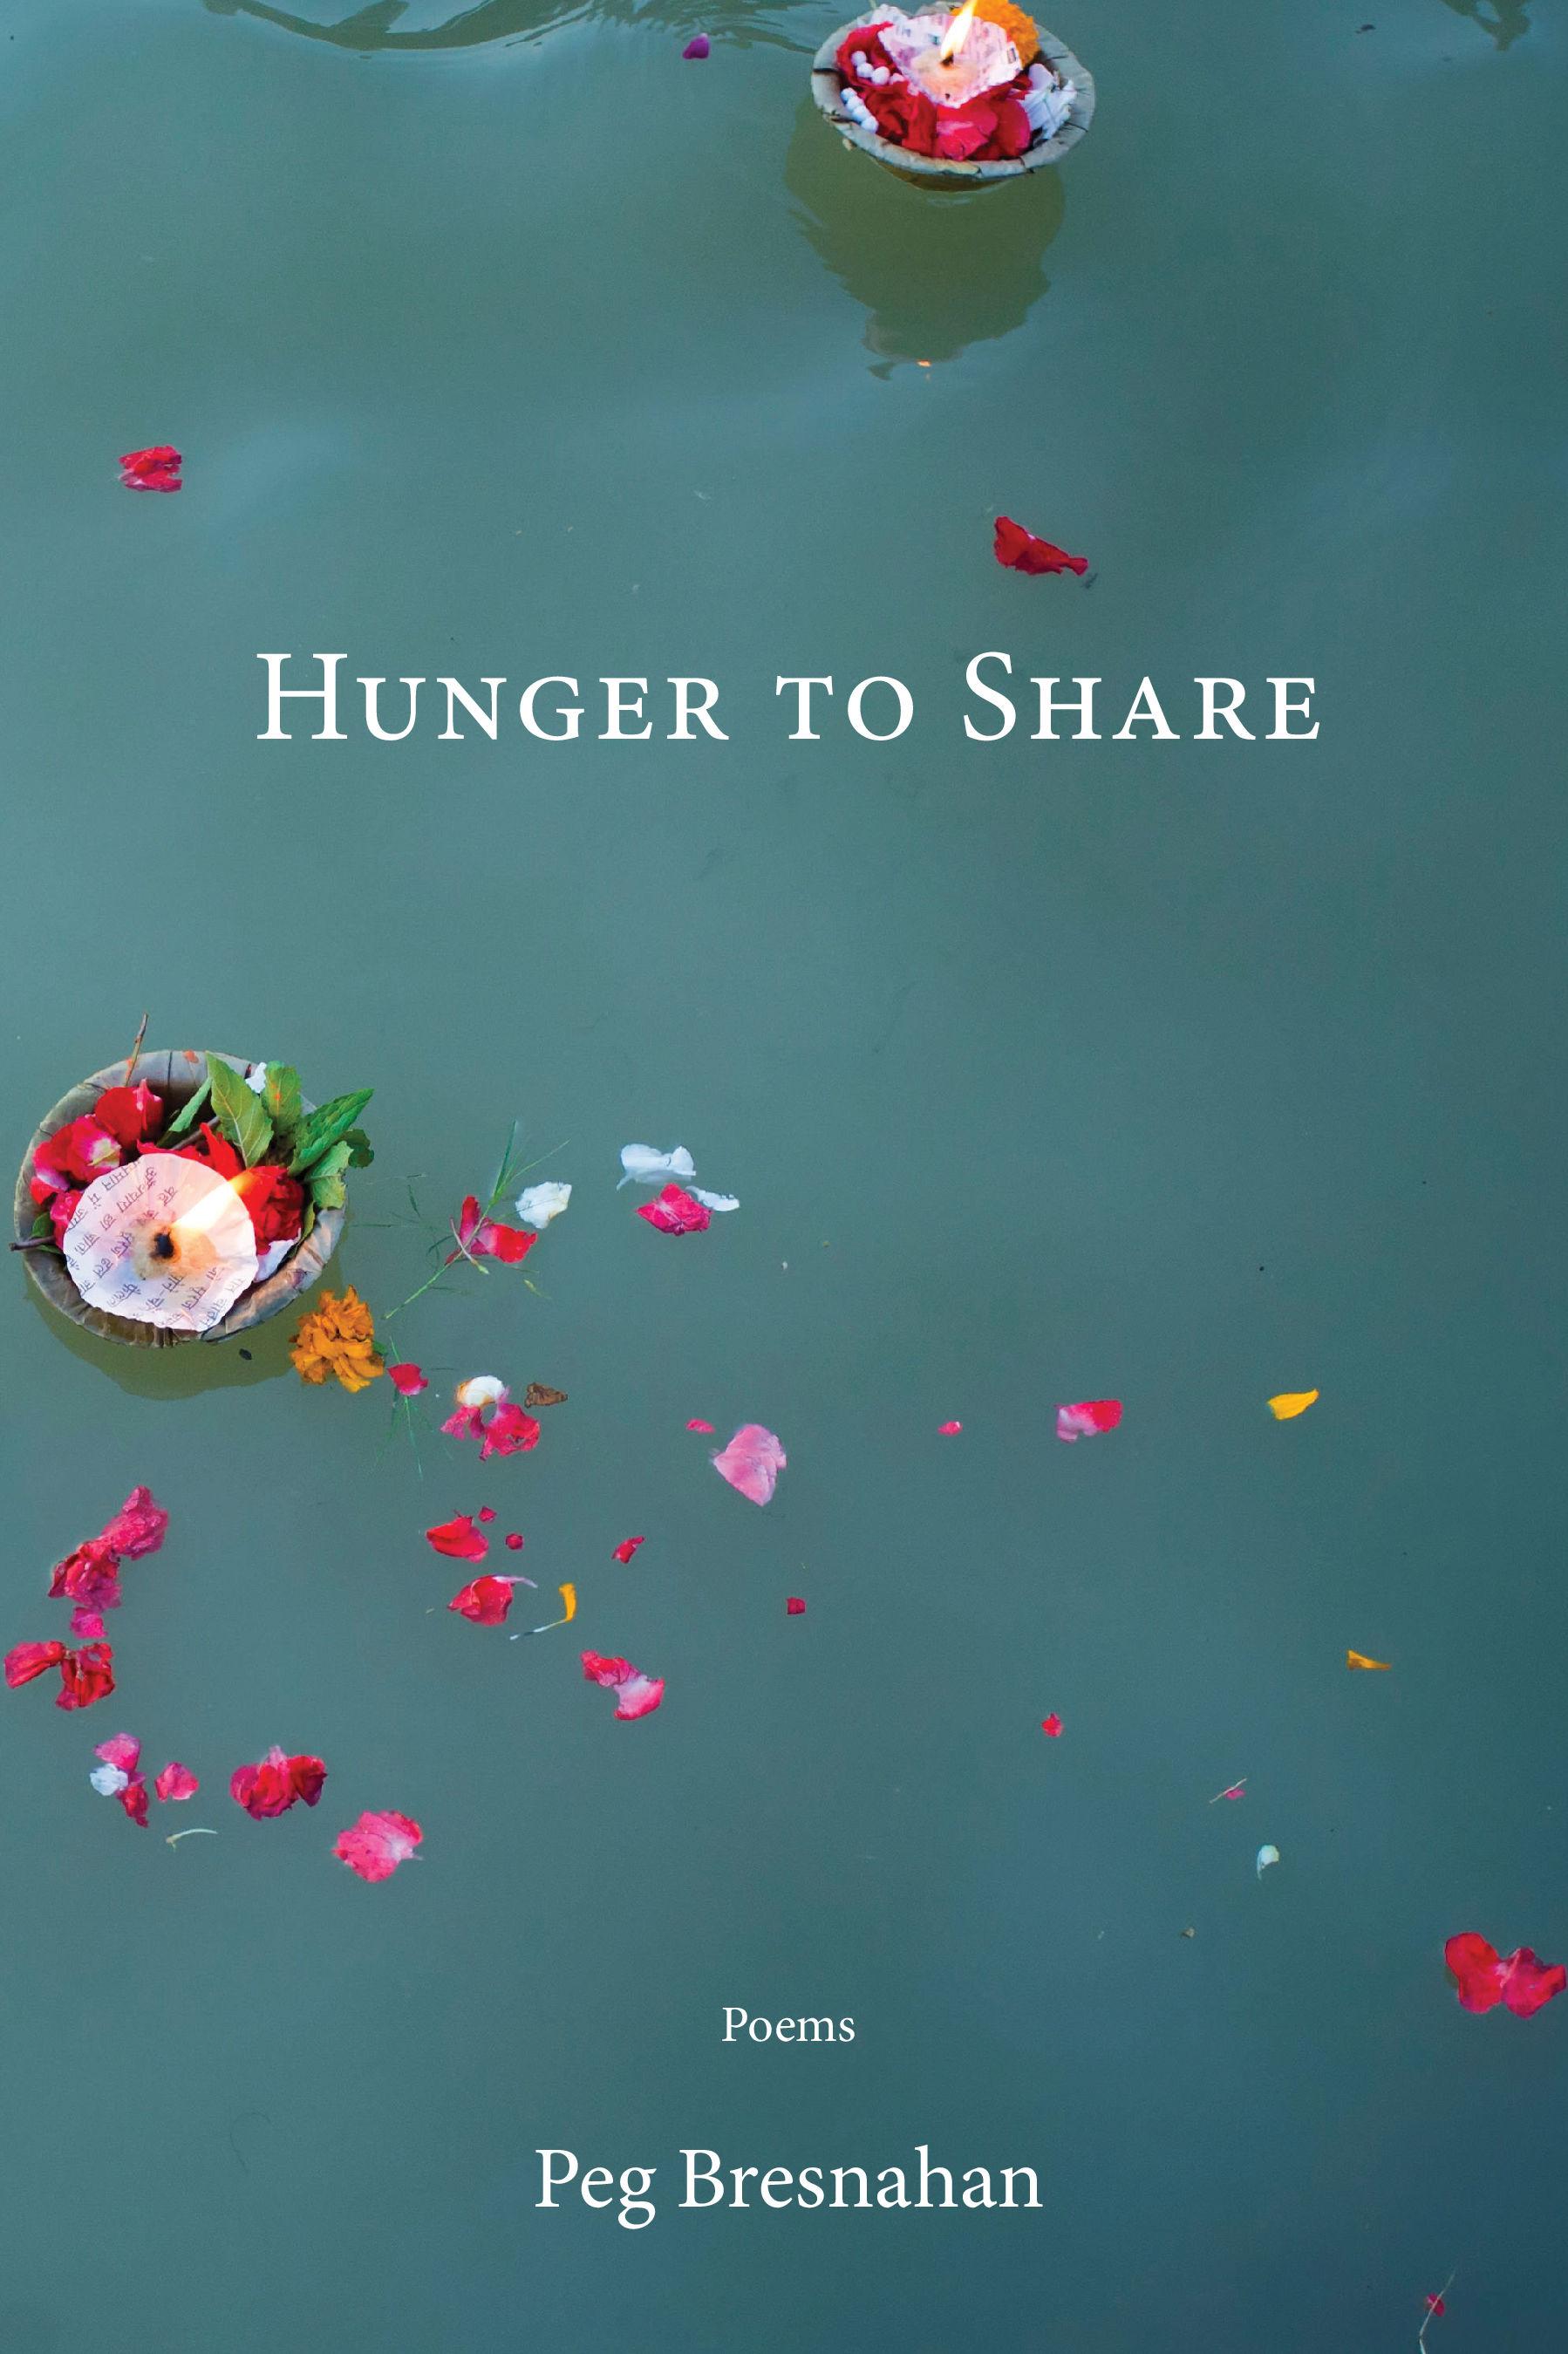 Hunger to Share by Peg Breanahan.jpg